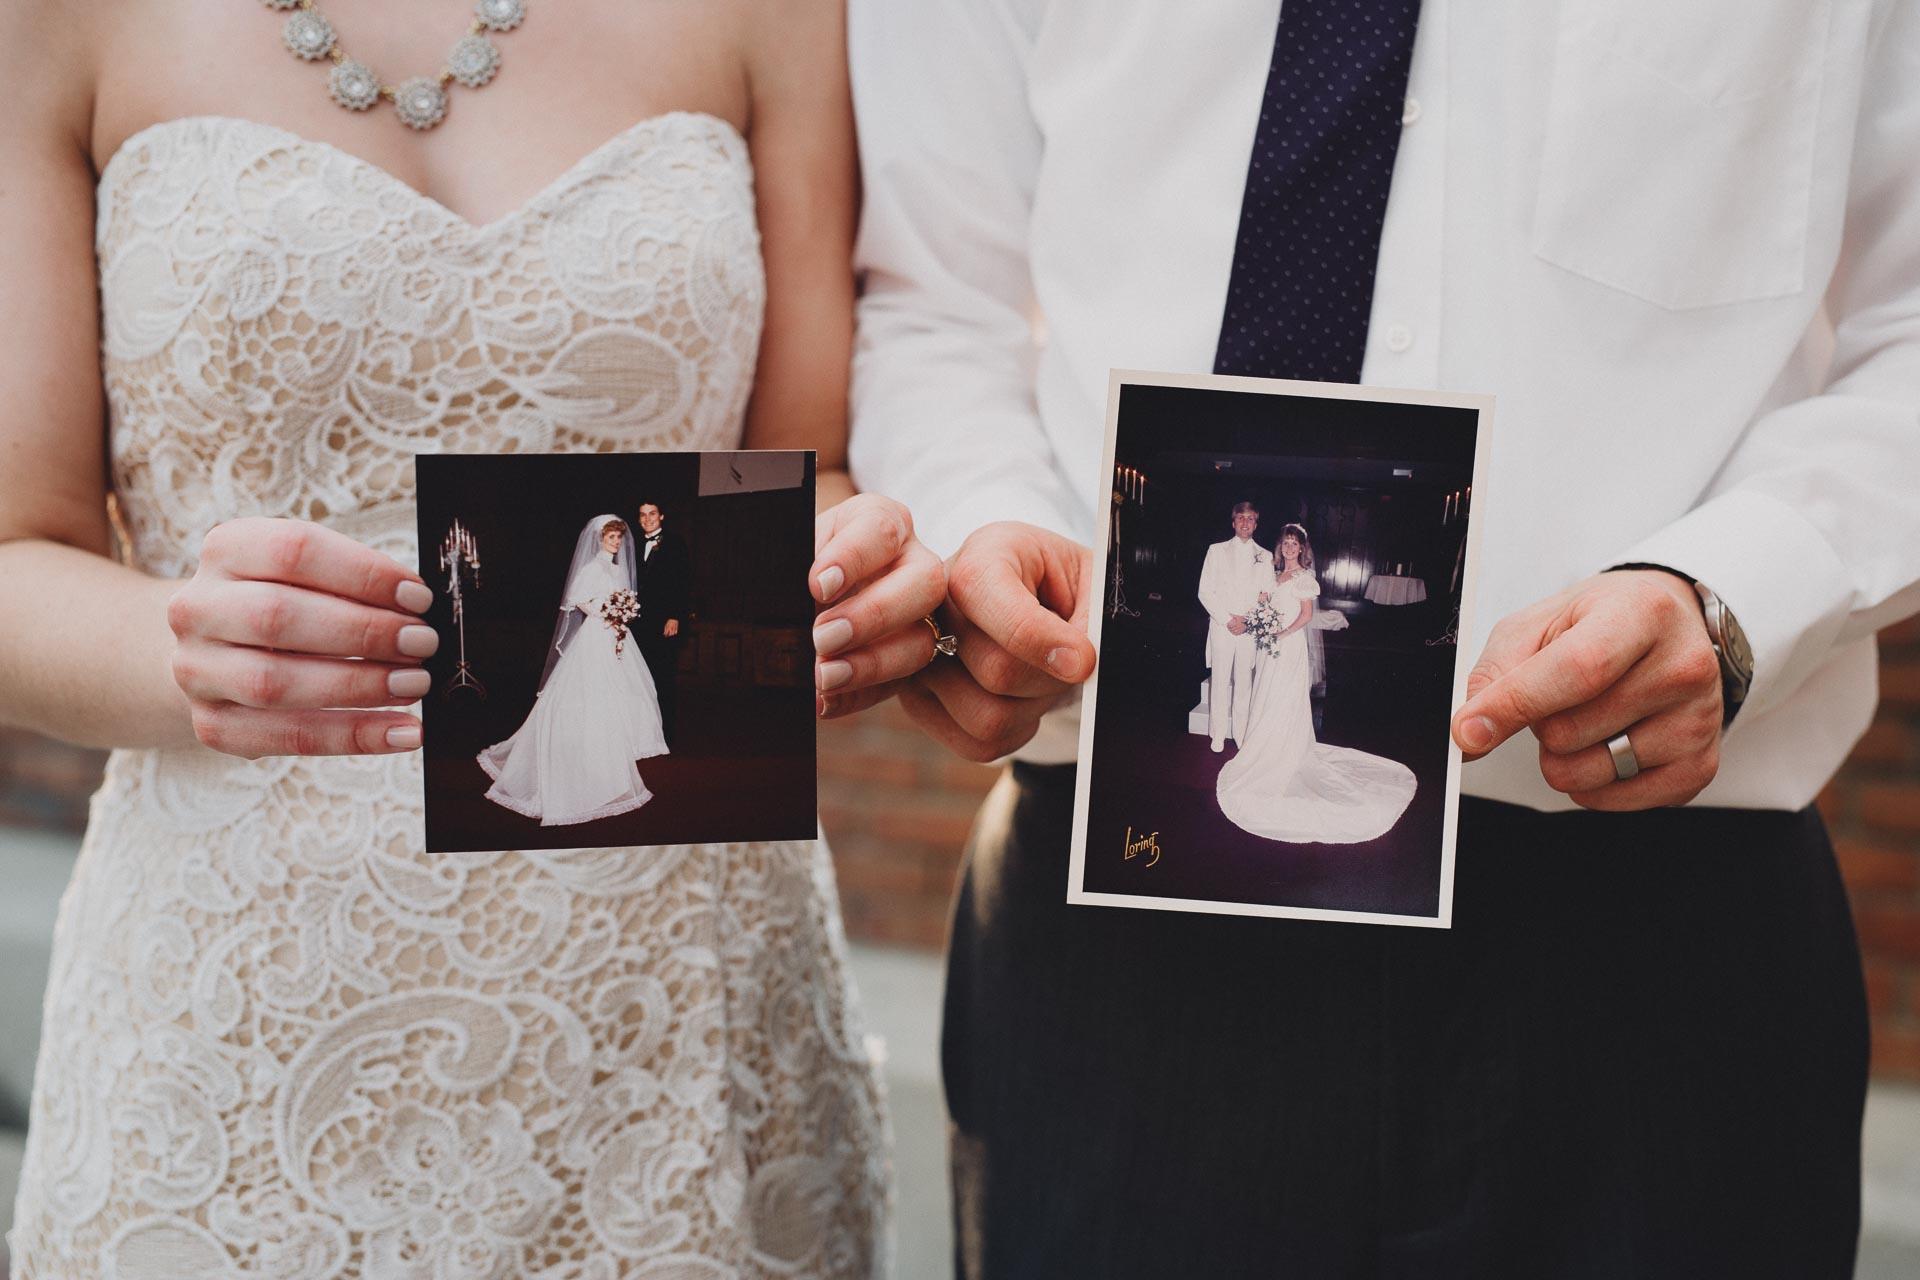 Julia-Michael-Cincinnati-Music-Hall-Wedding-089@2x.jpg